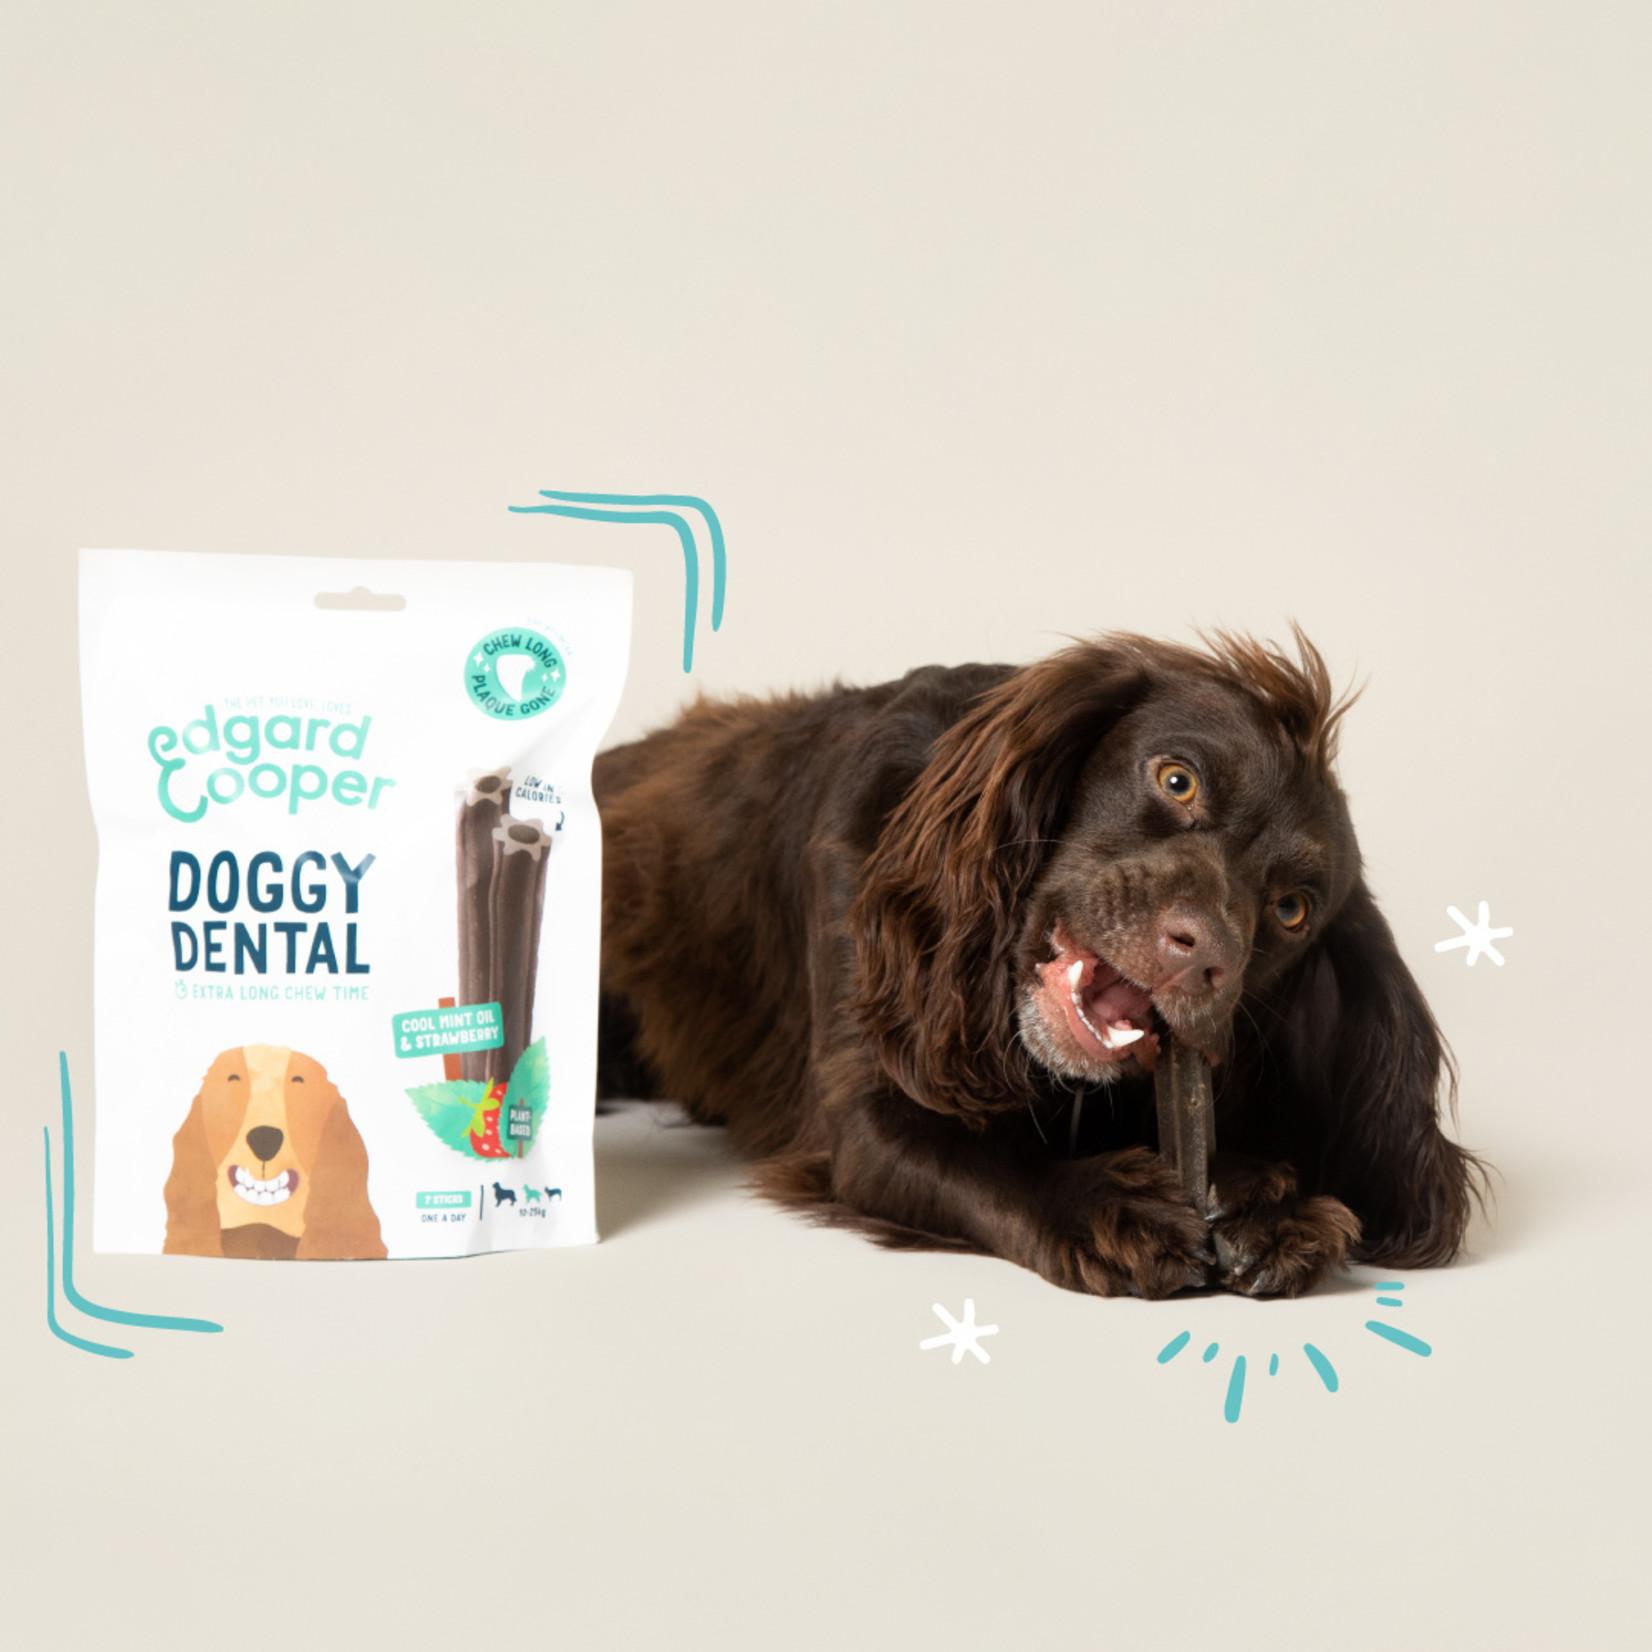 Edgar & Cooper E&C Doggy Dental Strawberry & Mint